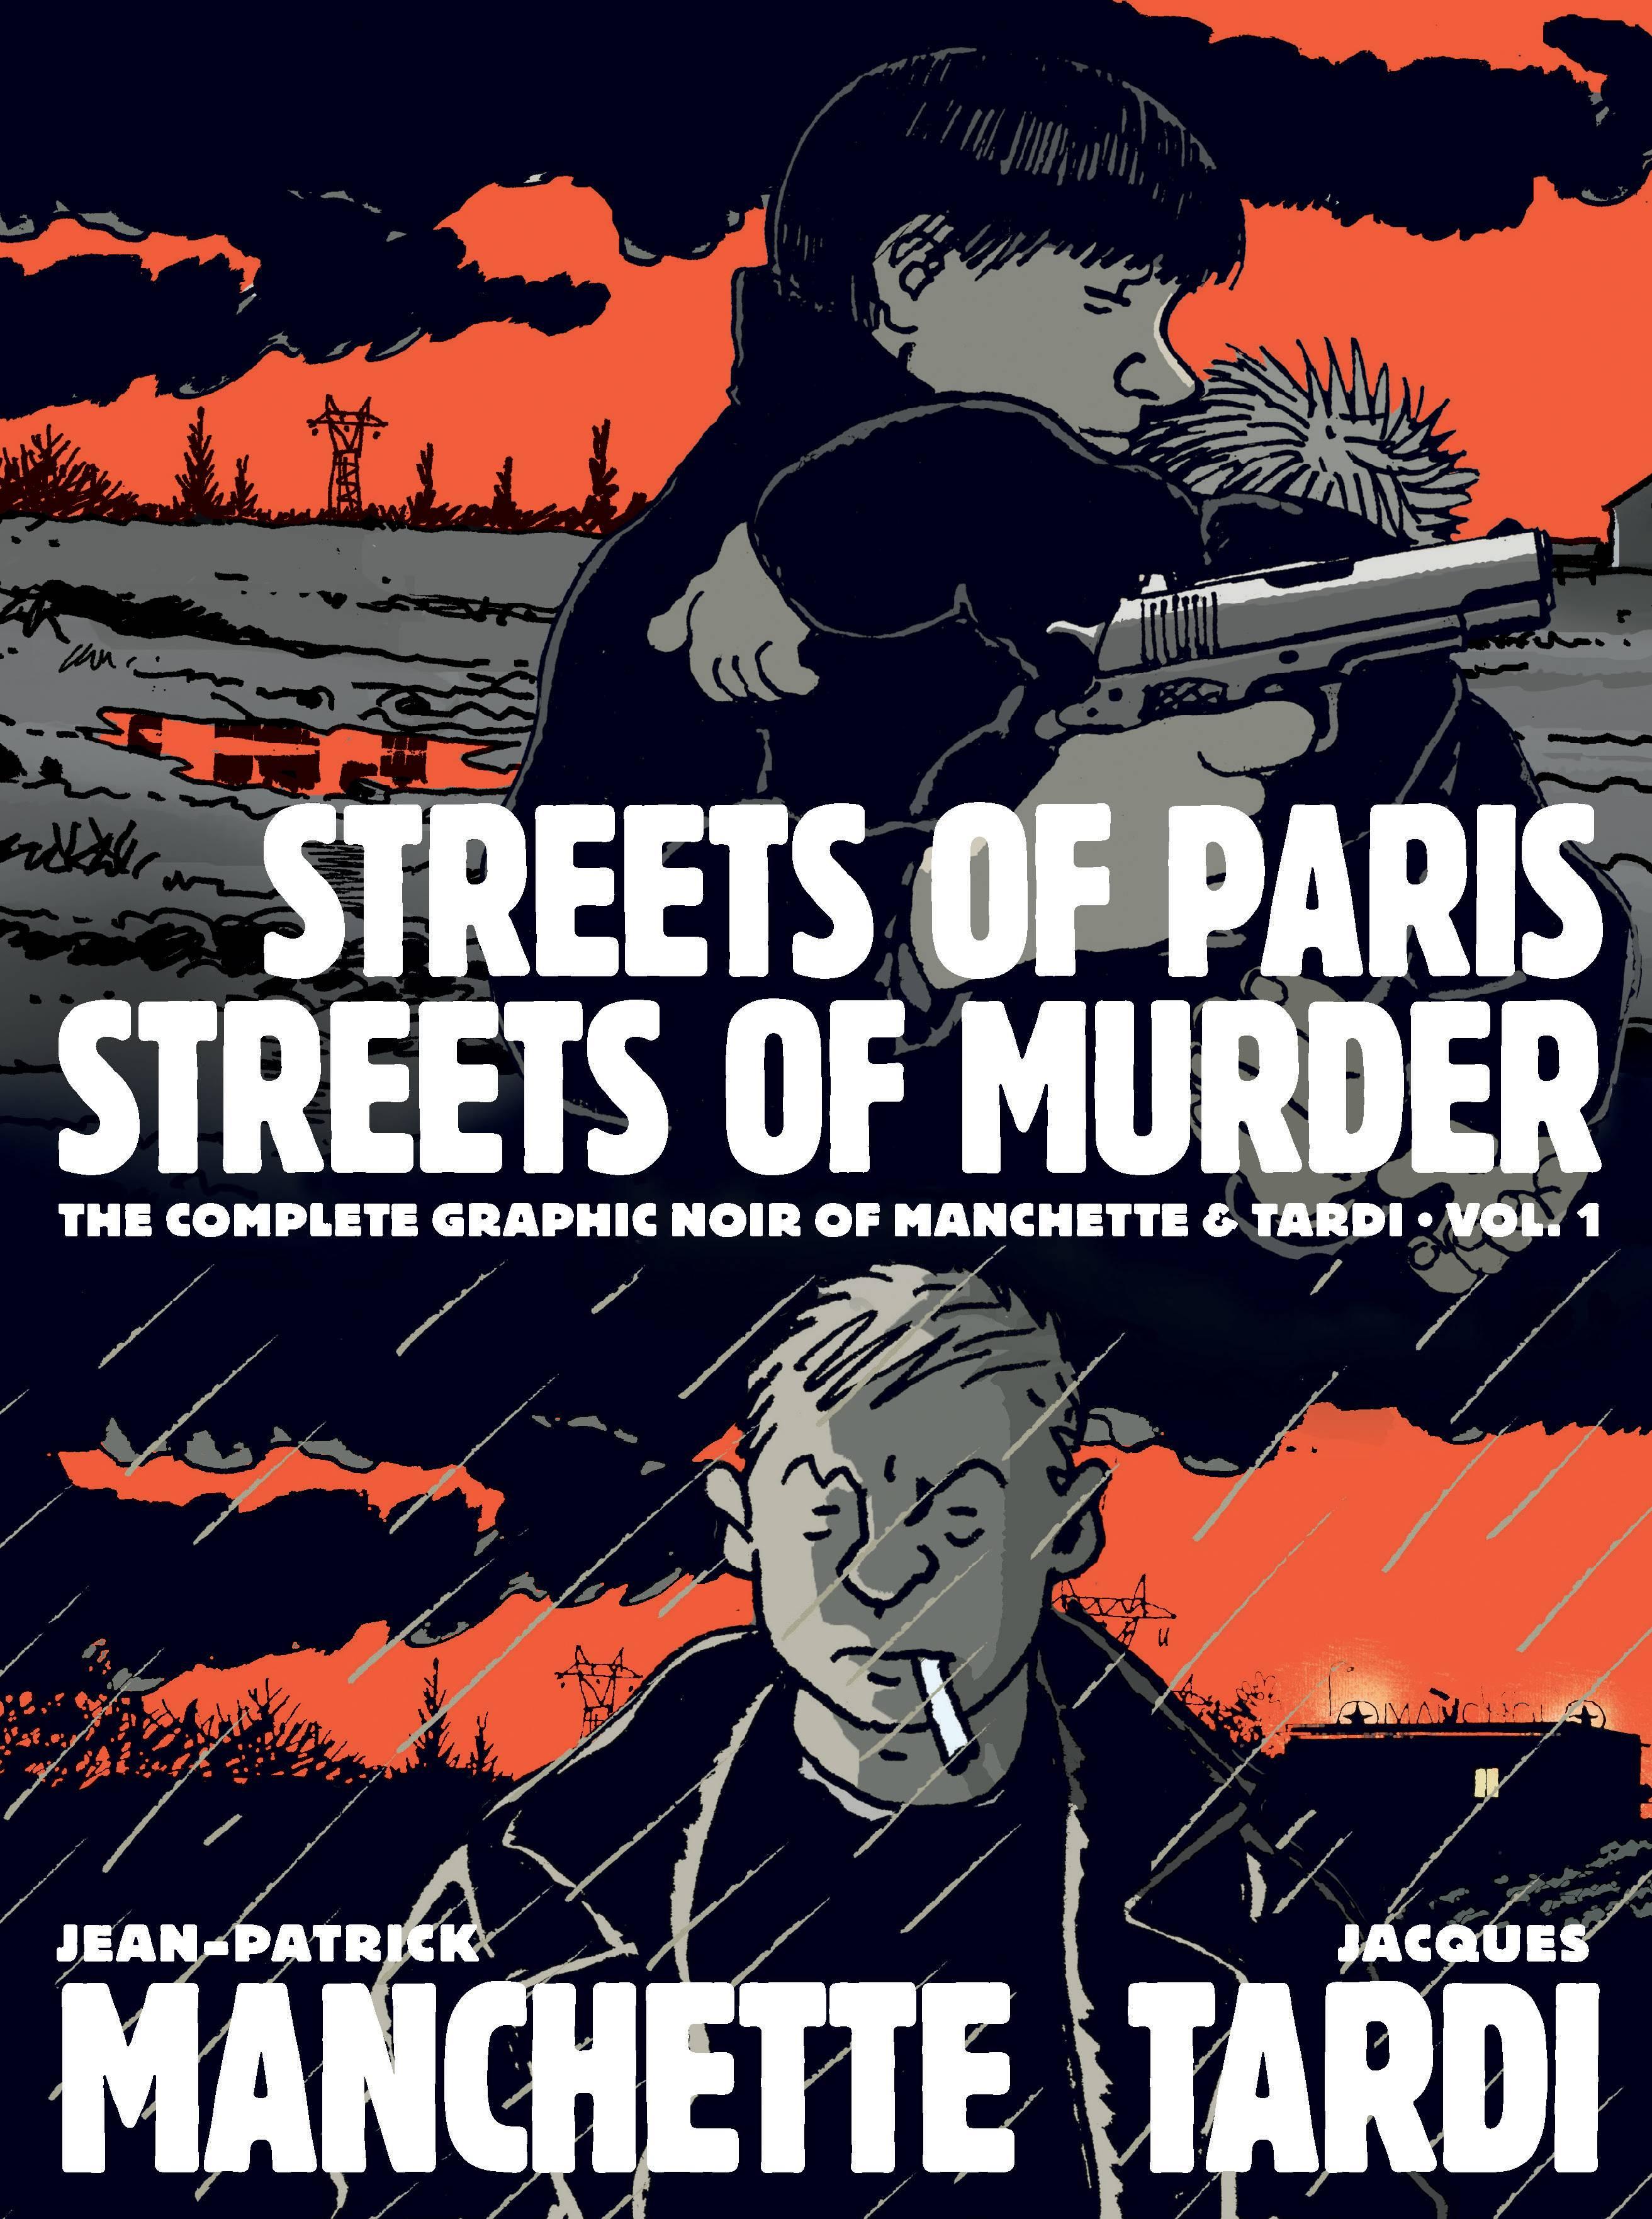 COMPLETE NOIR MANCHETTE TARDI HC 01 STREETS PARIS MURDER